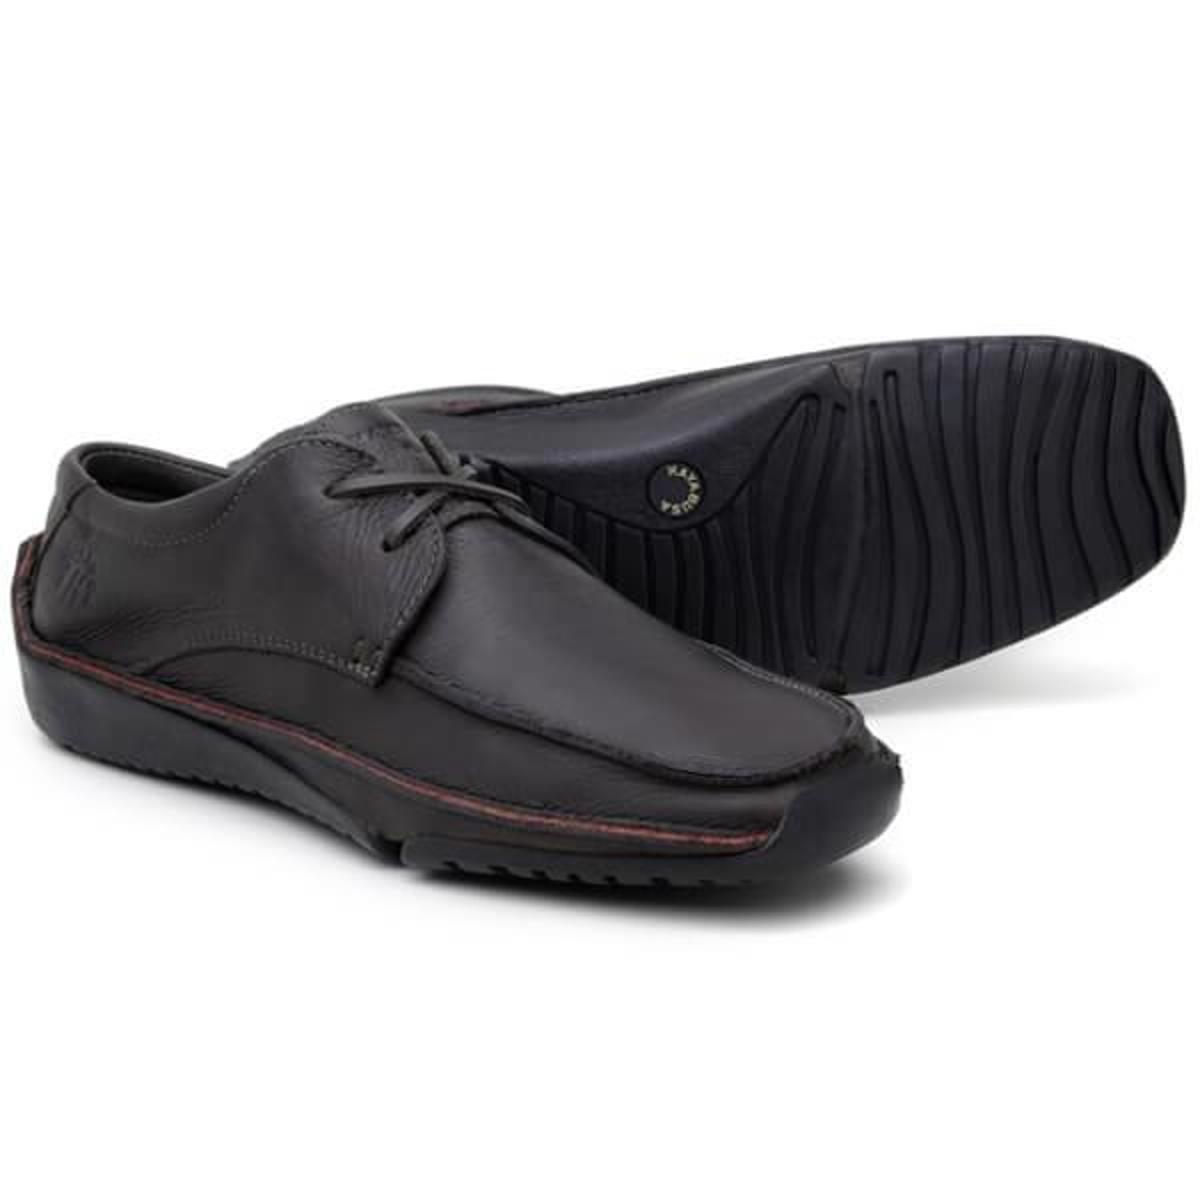 Sapato Em Couro Hayabusa Duna 60 - Chocolate Masculino - Marrom